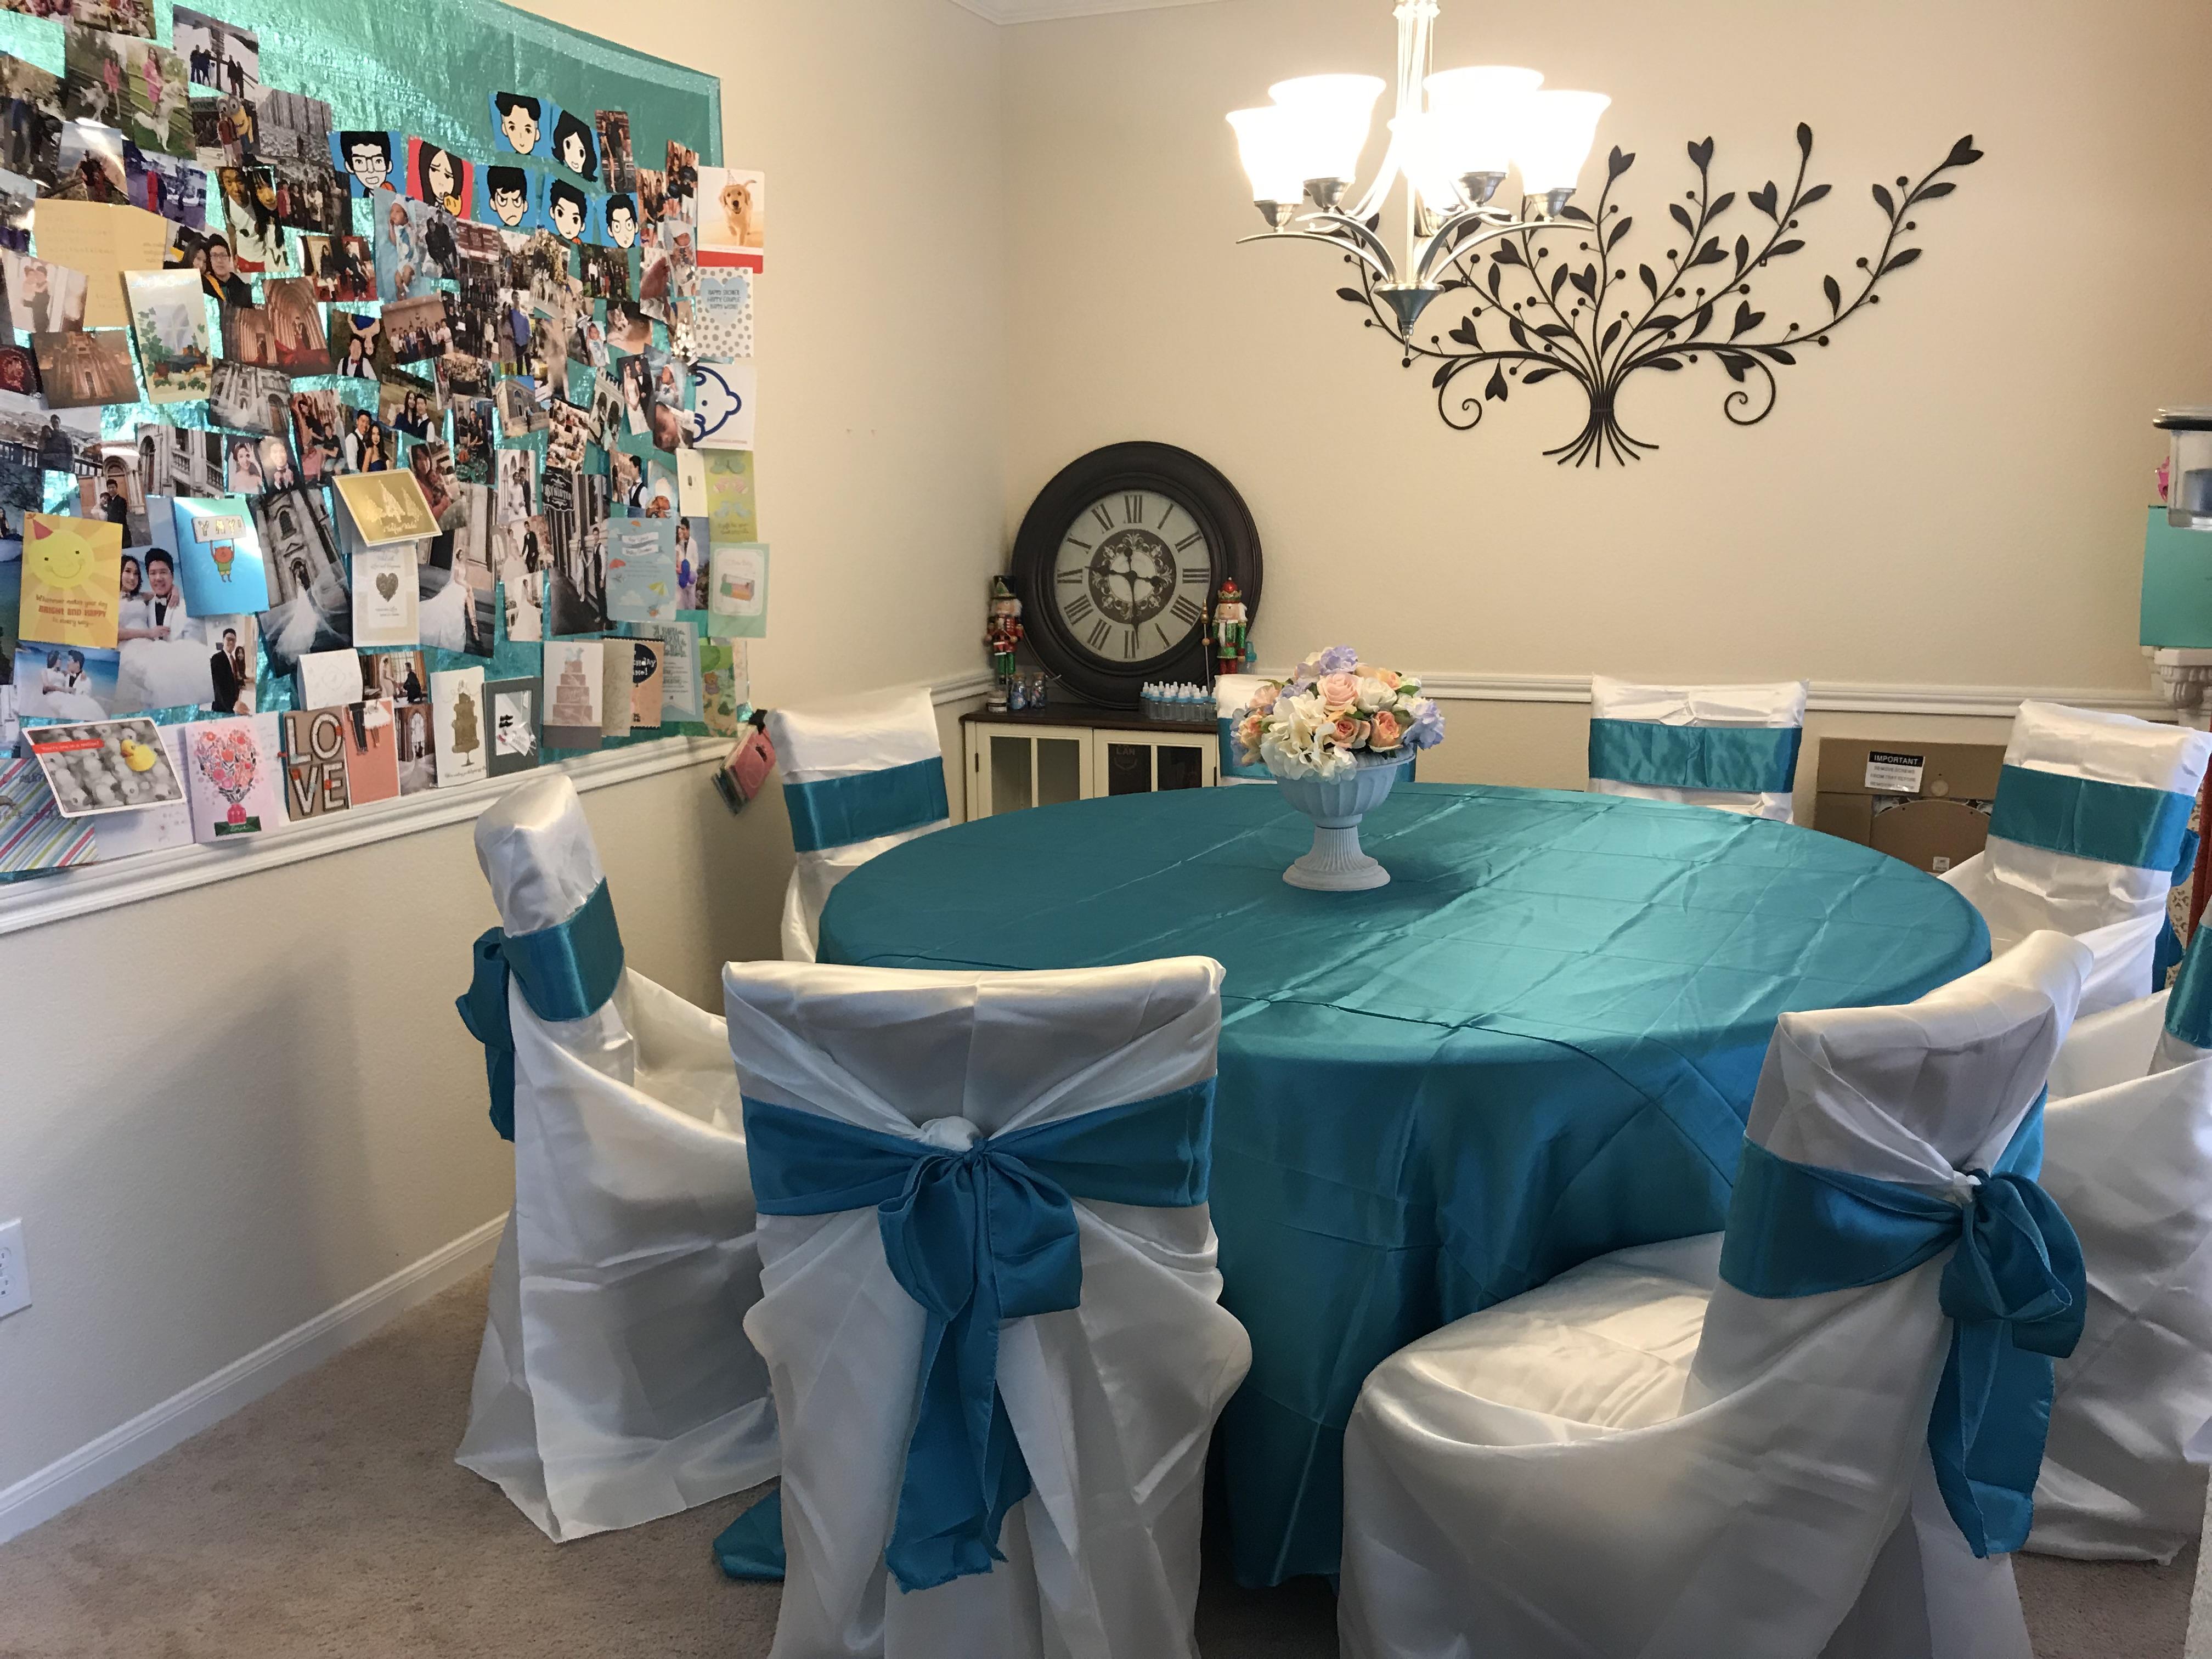 Houston Best Wedding planner|Houston Top Weddings Planning|休斯顿婚庆公司 Houston Best Event planner|Housto